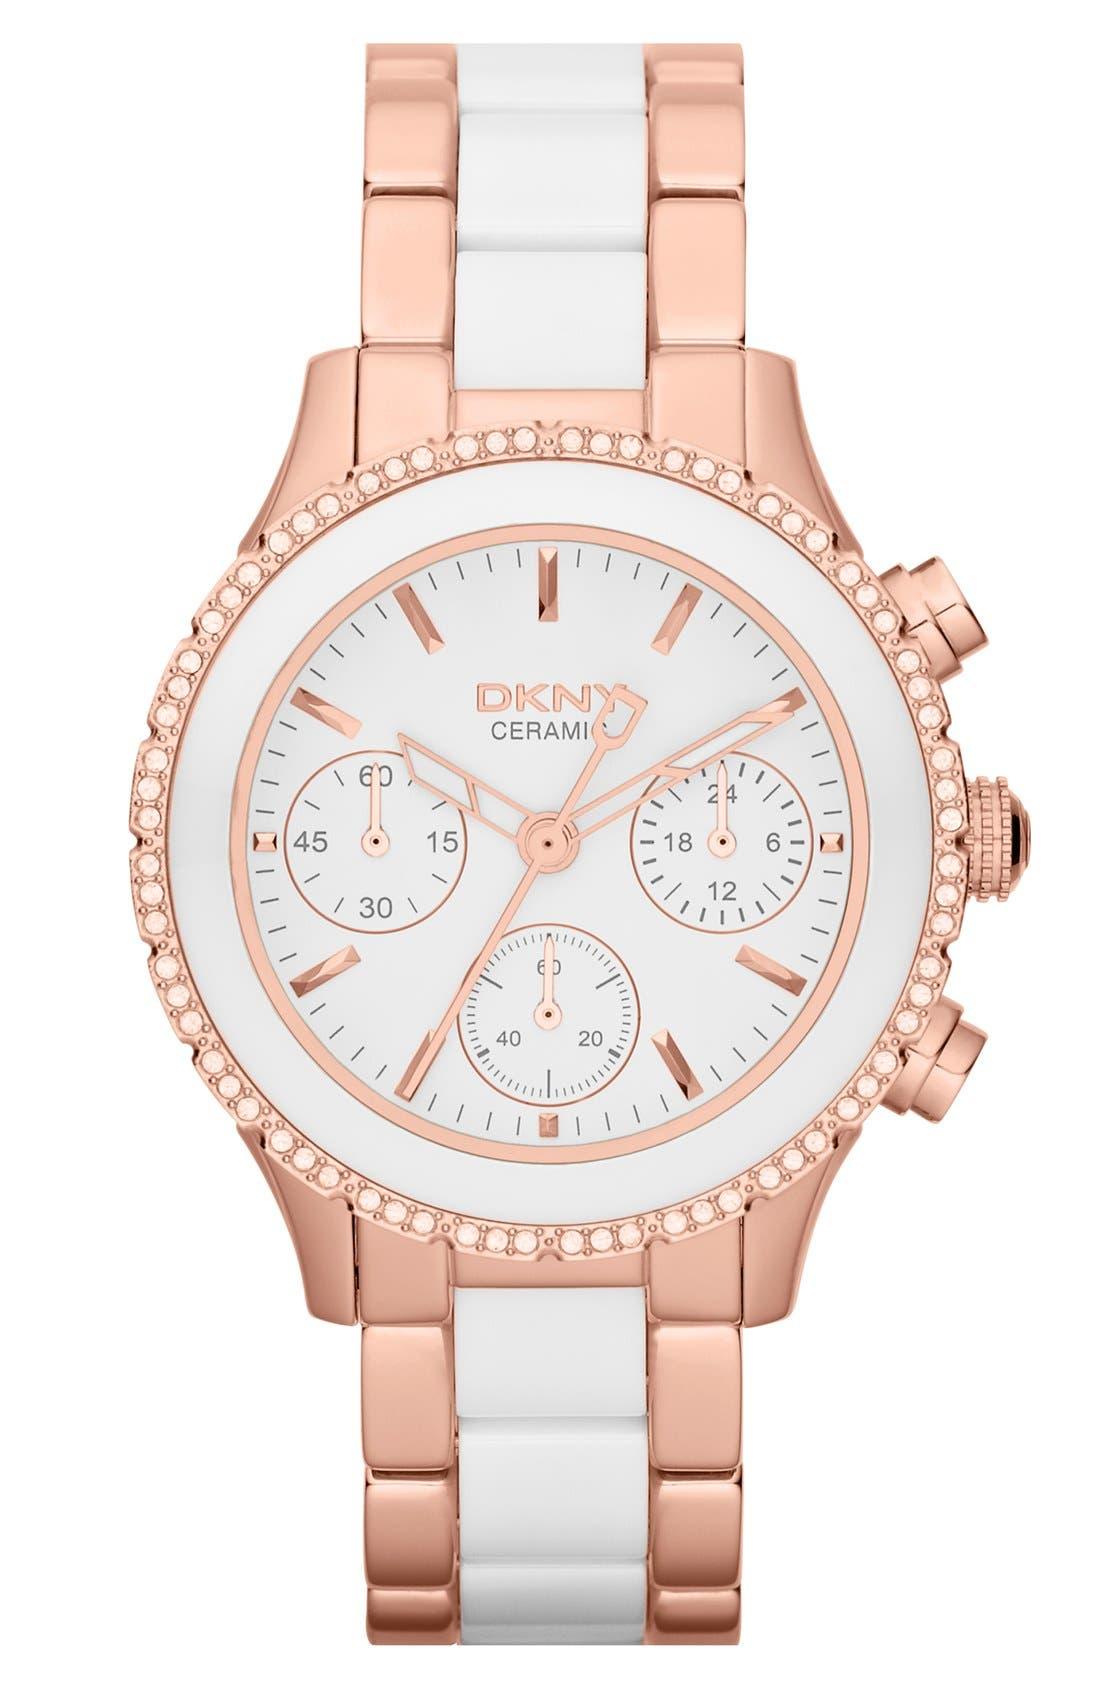 Main Image - DKNY 'Westside' Crystal Bezel Chronograph Ceramic Bracelet Watch, 38mm